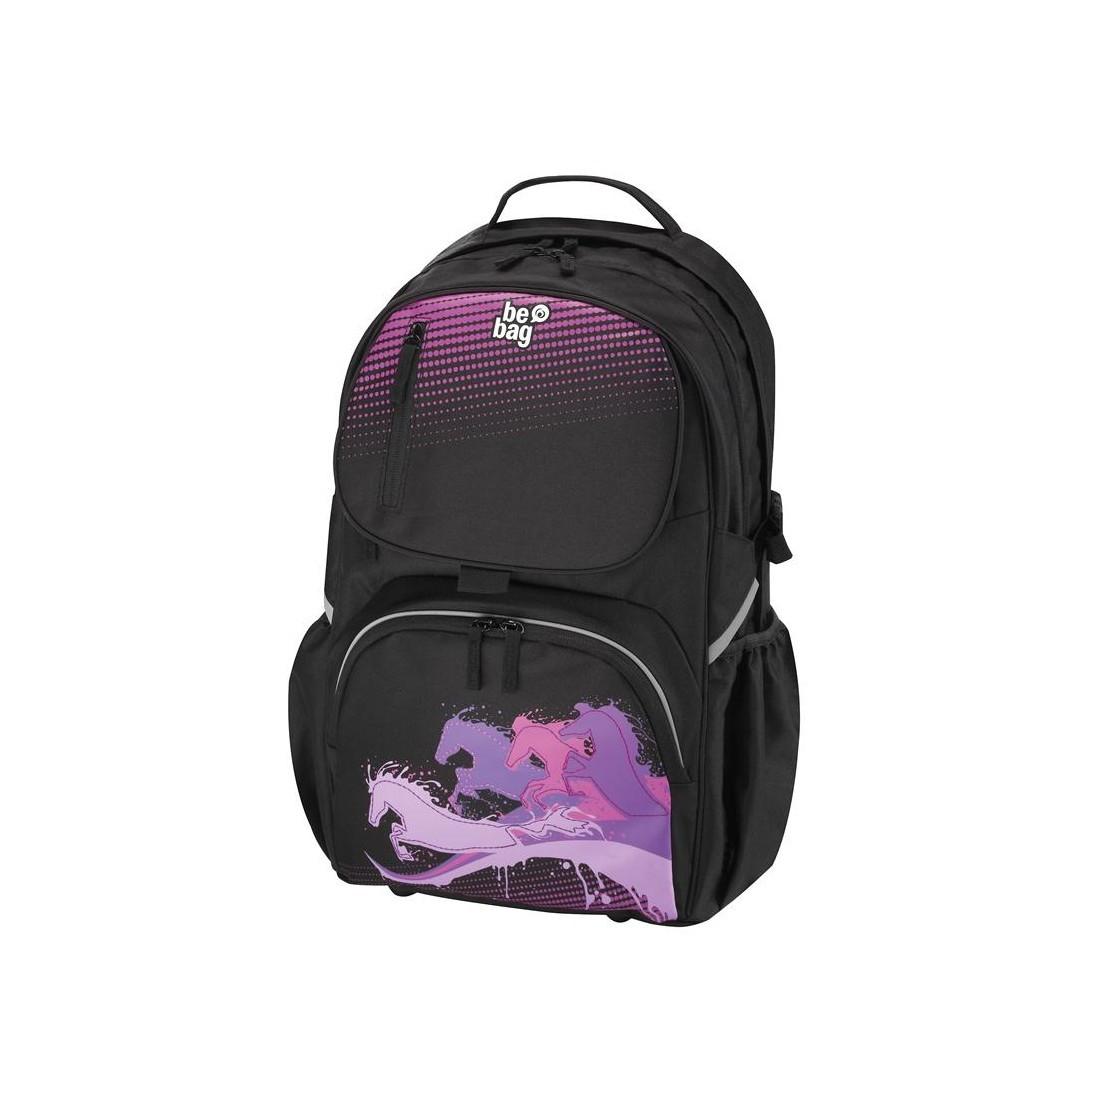 Plecak be bag cube wyprofilowany HORSE POWER